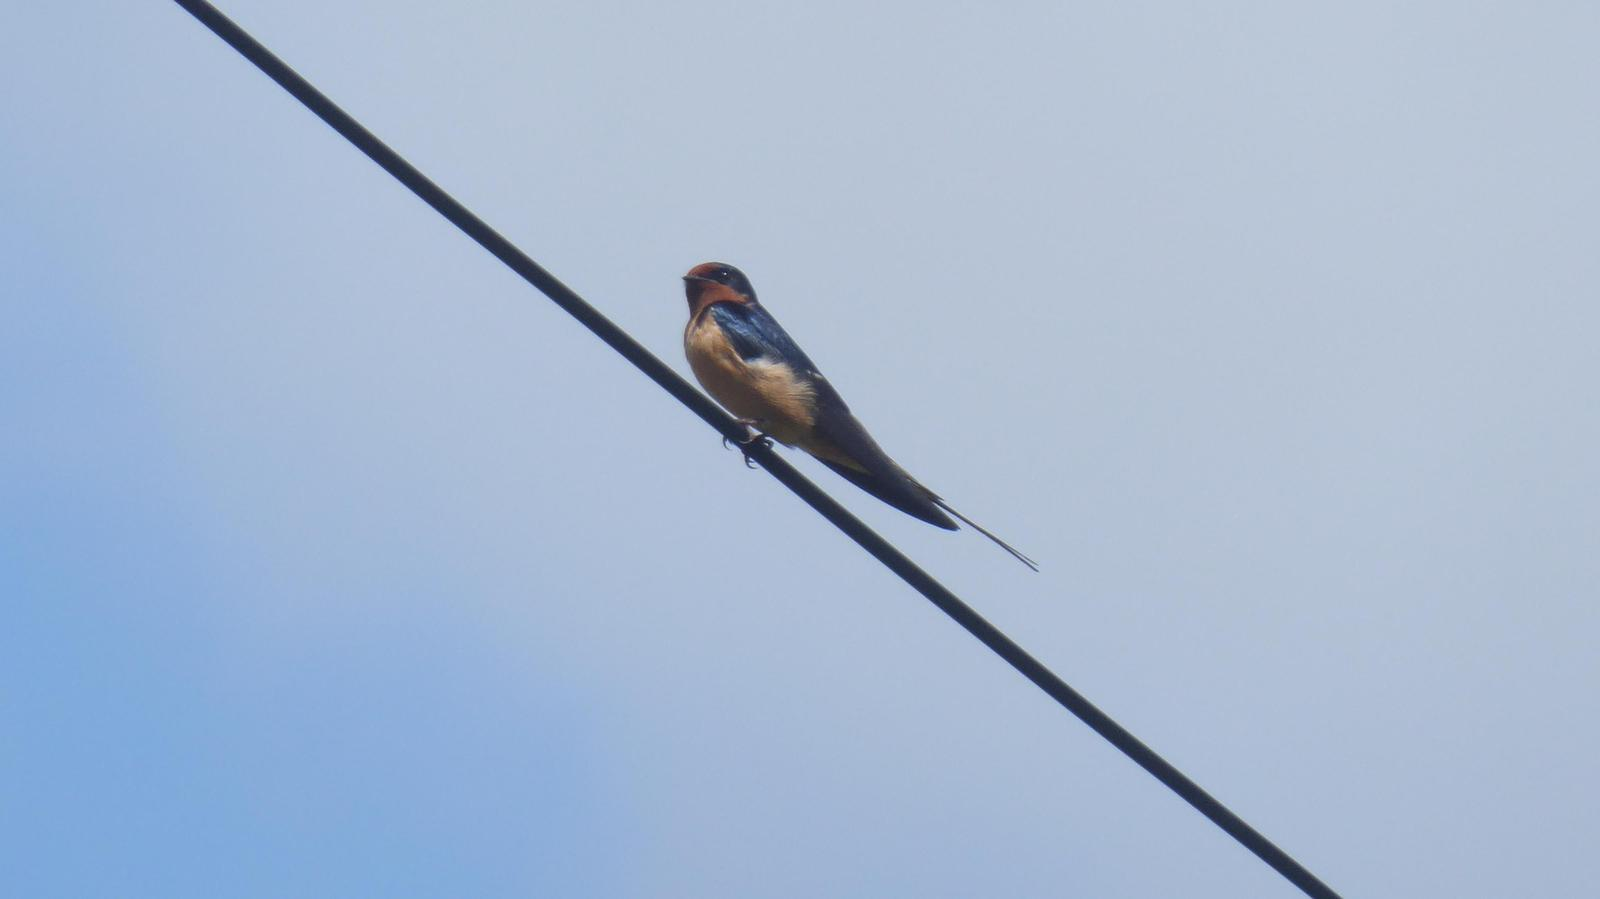 Barn Swallow Photo by Daliel Leite